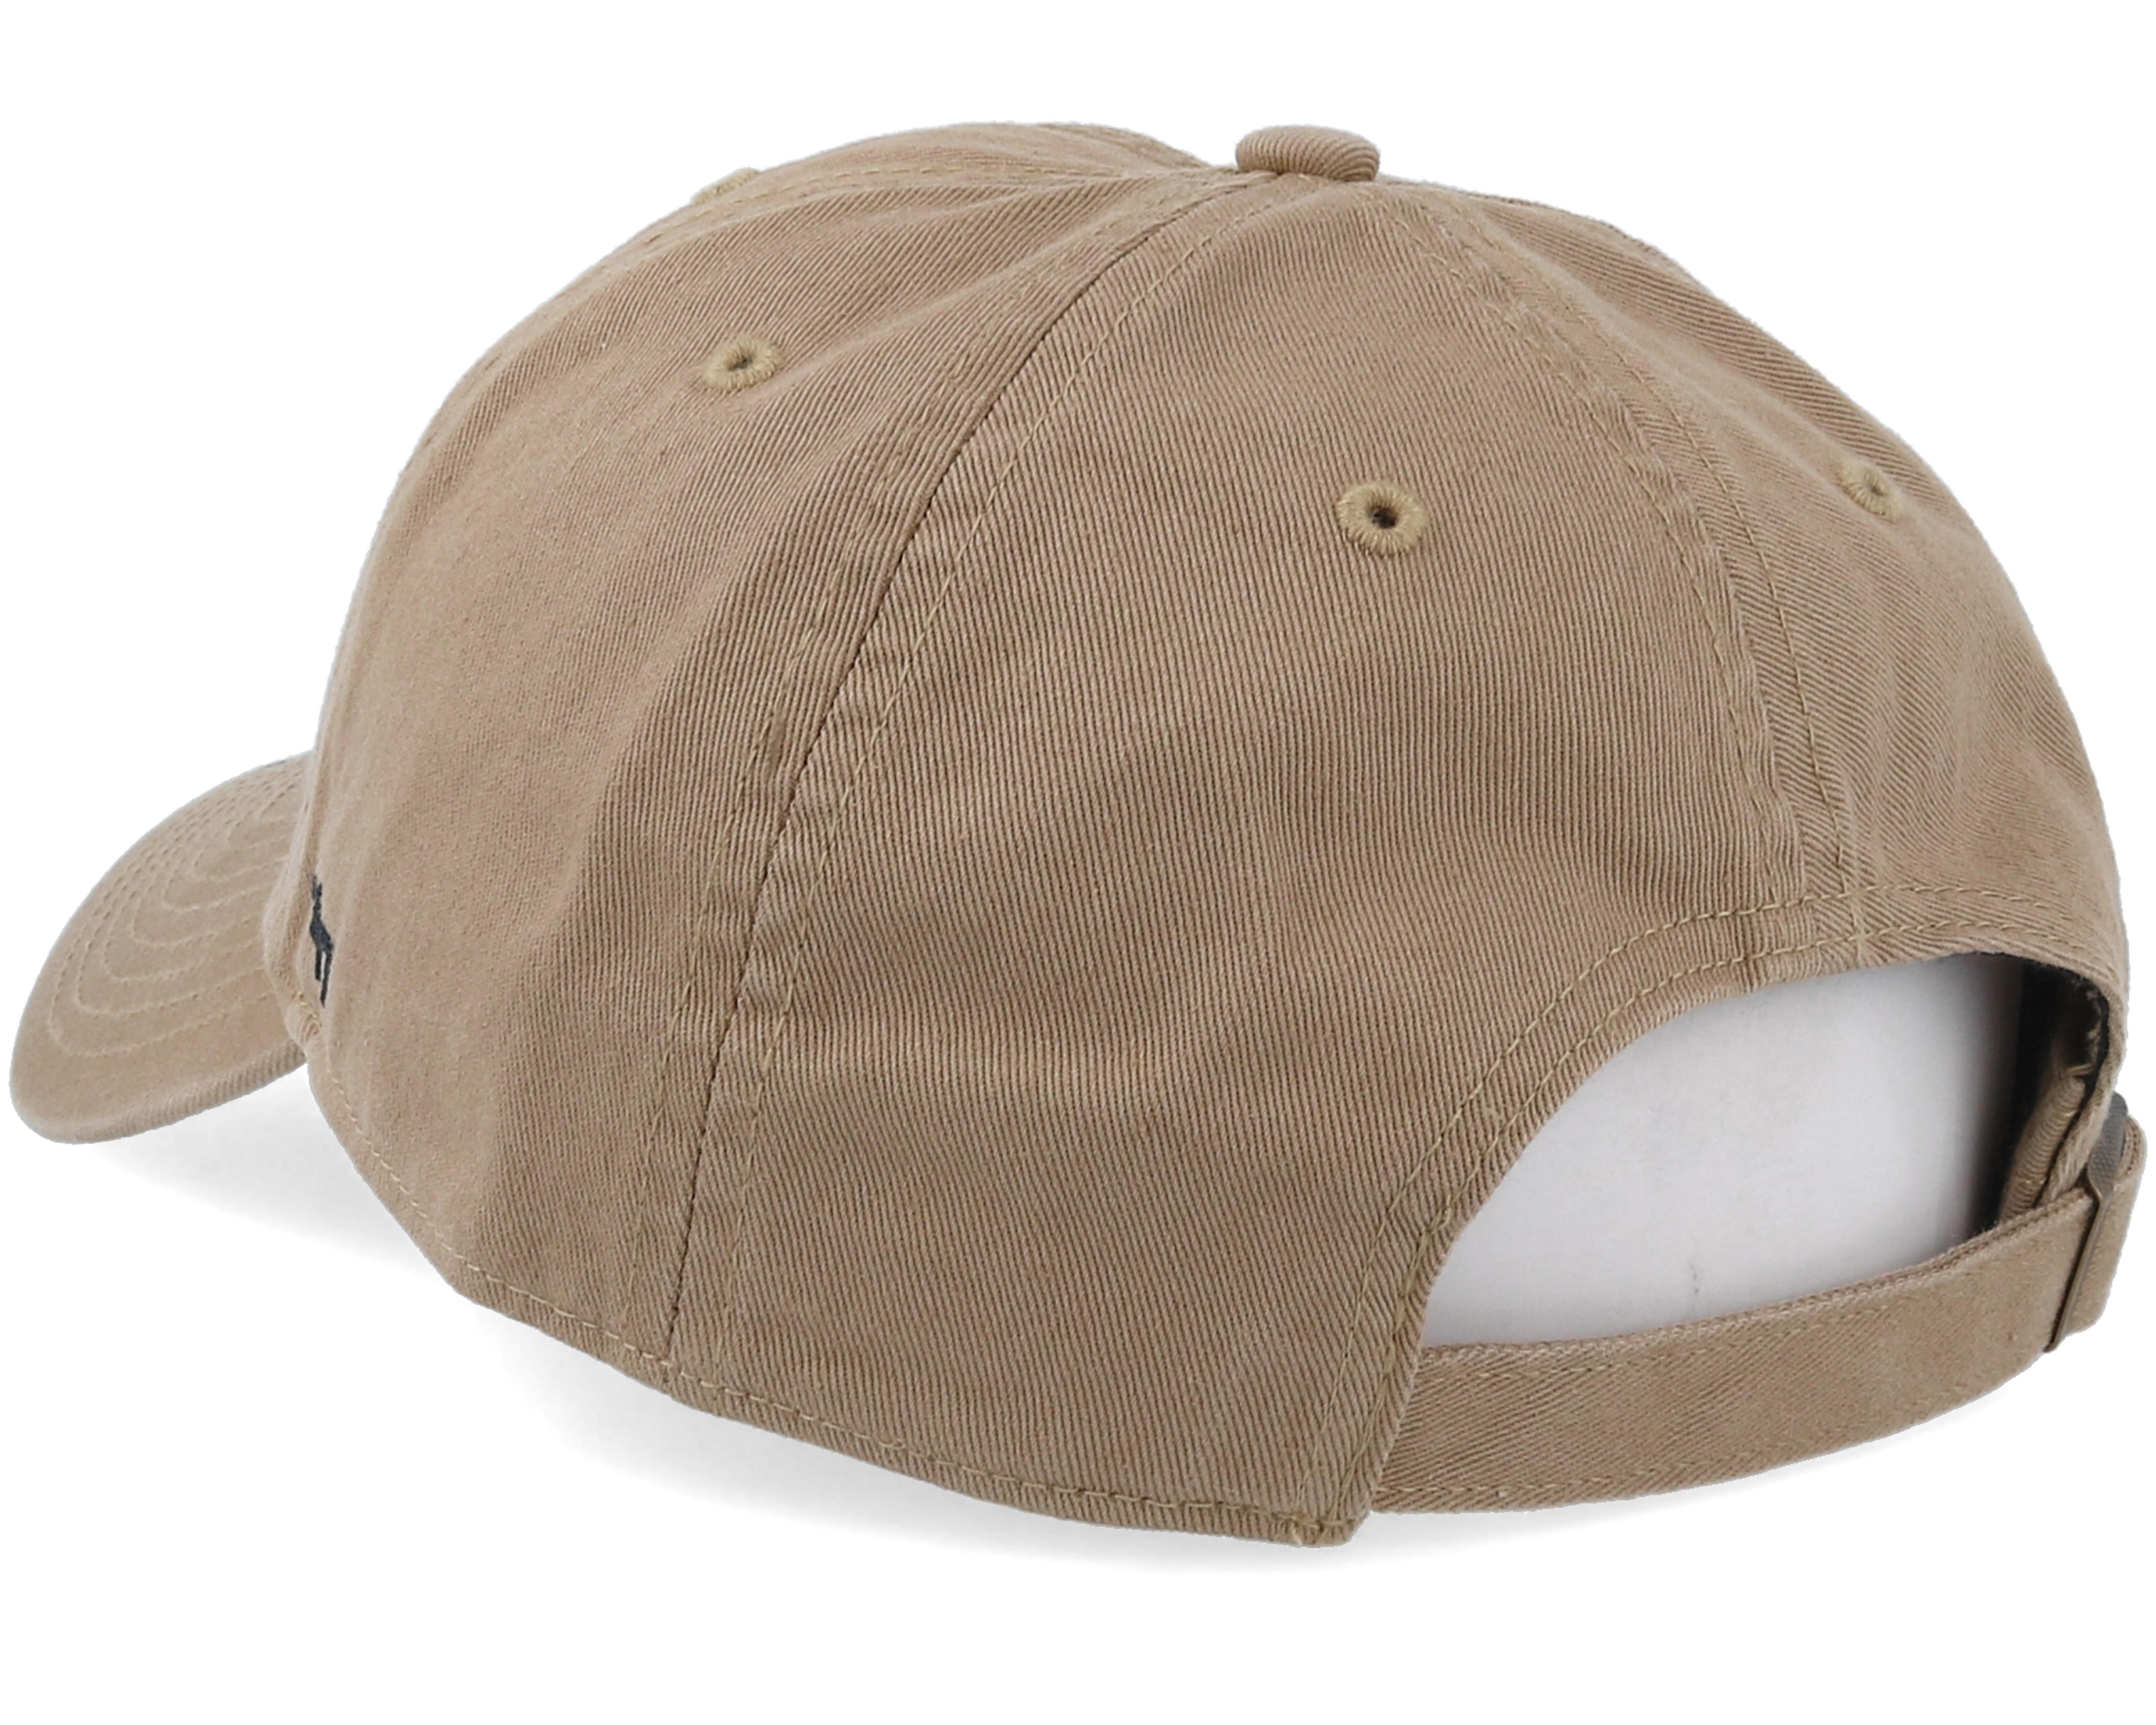 ddd735ba New York Yankees Clean Up Khaki/Navy Adjustable - 47 Brand cap ...